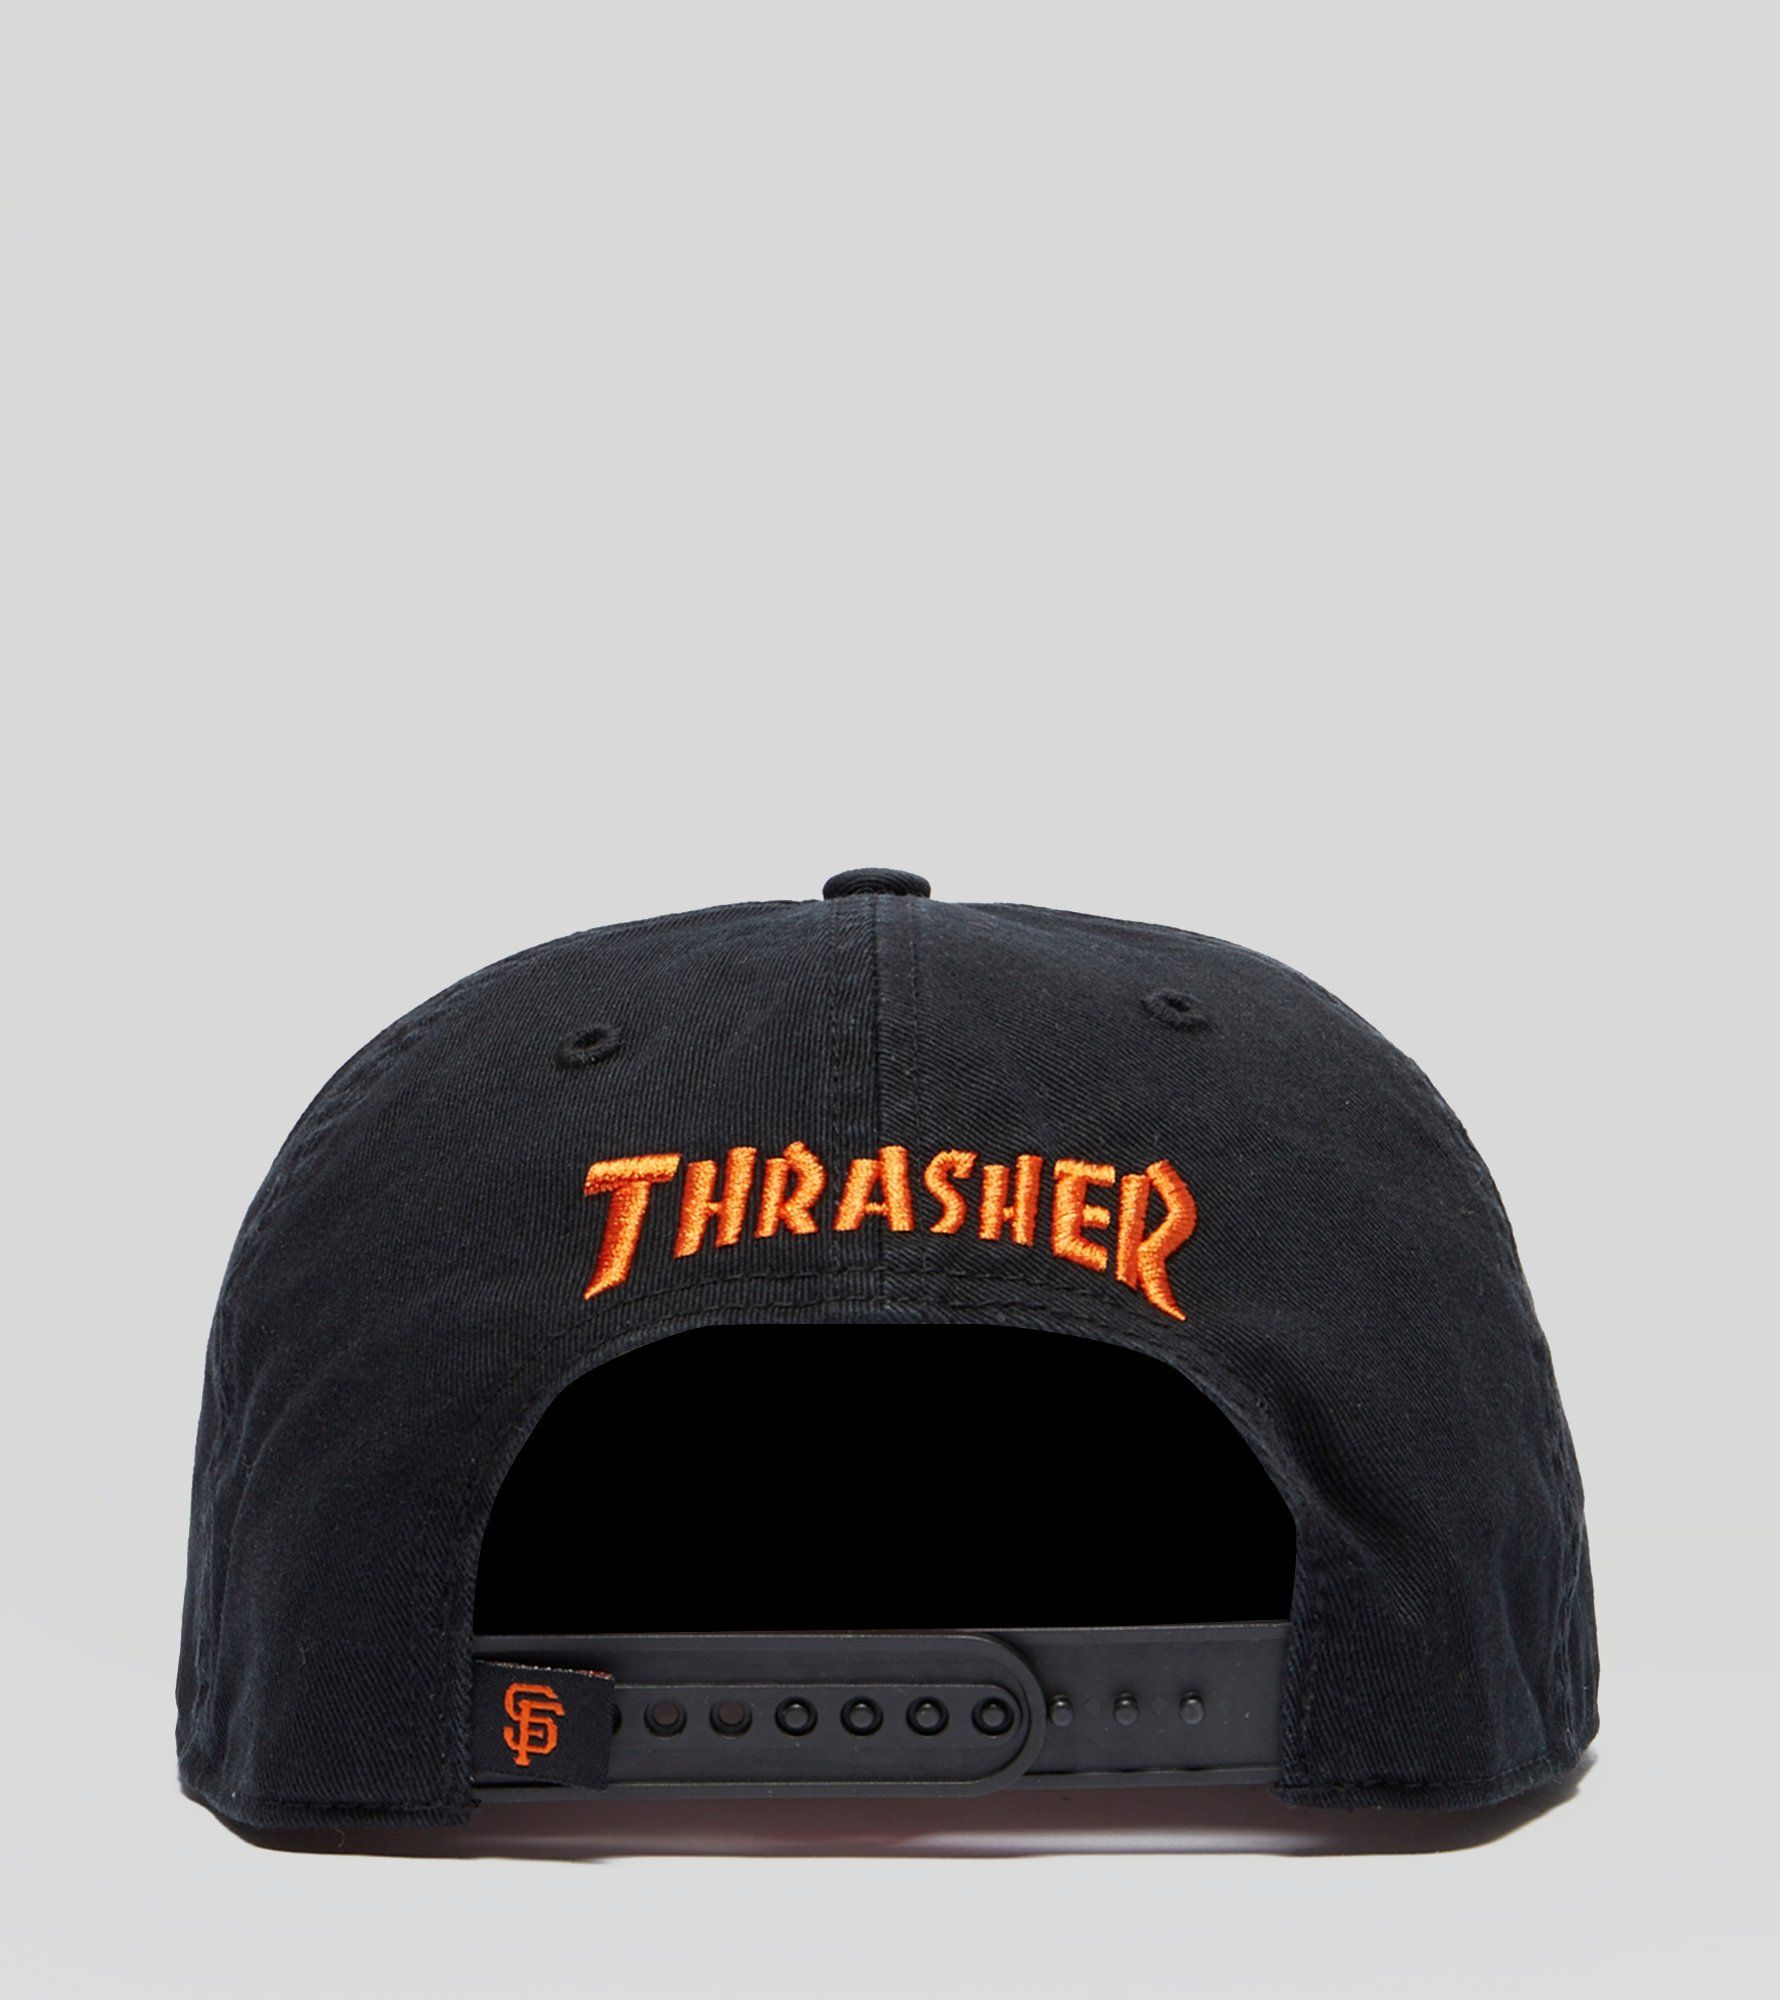 47 Brand x Thrasher SF Giants Goldmerrow Cap